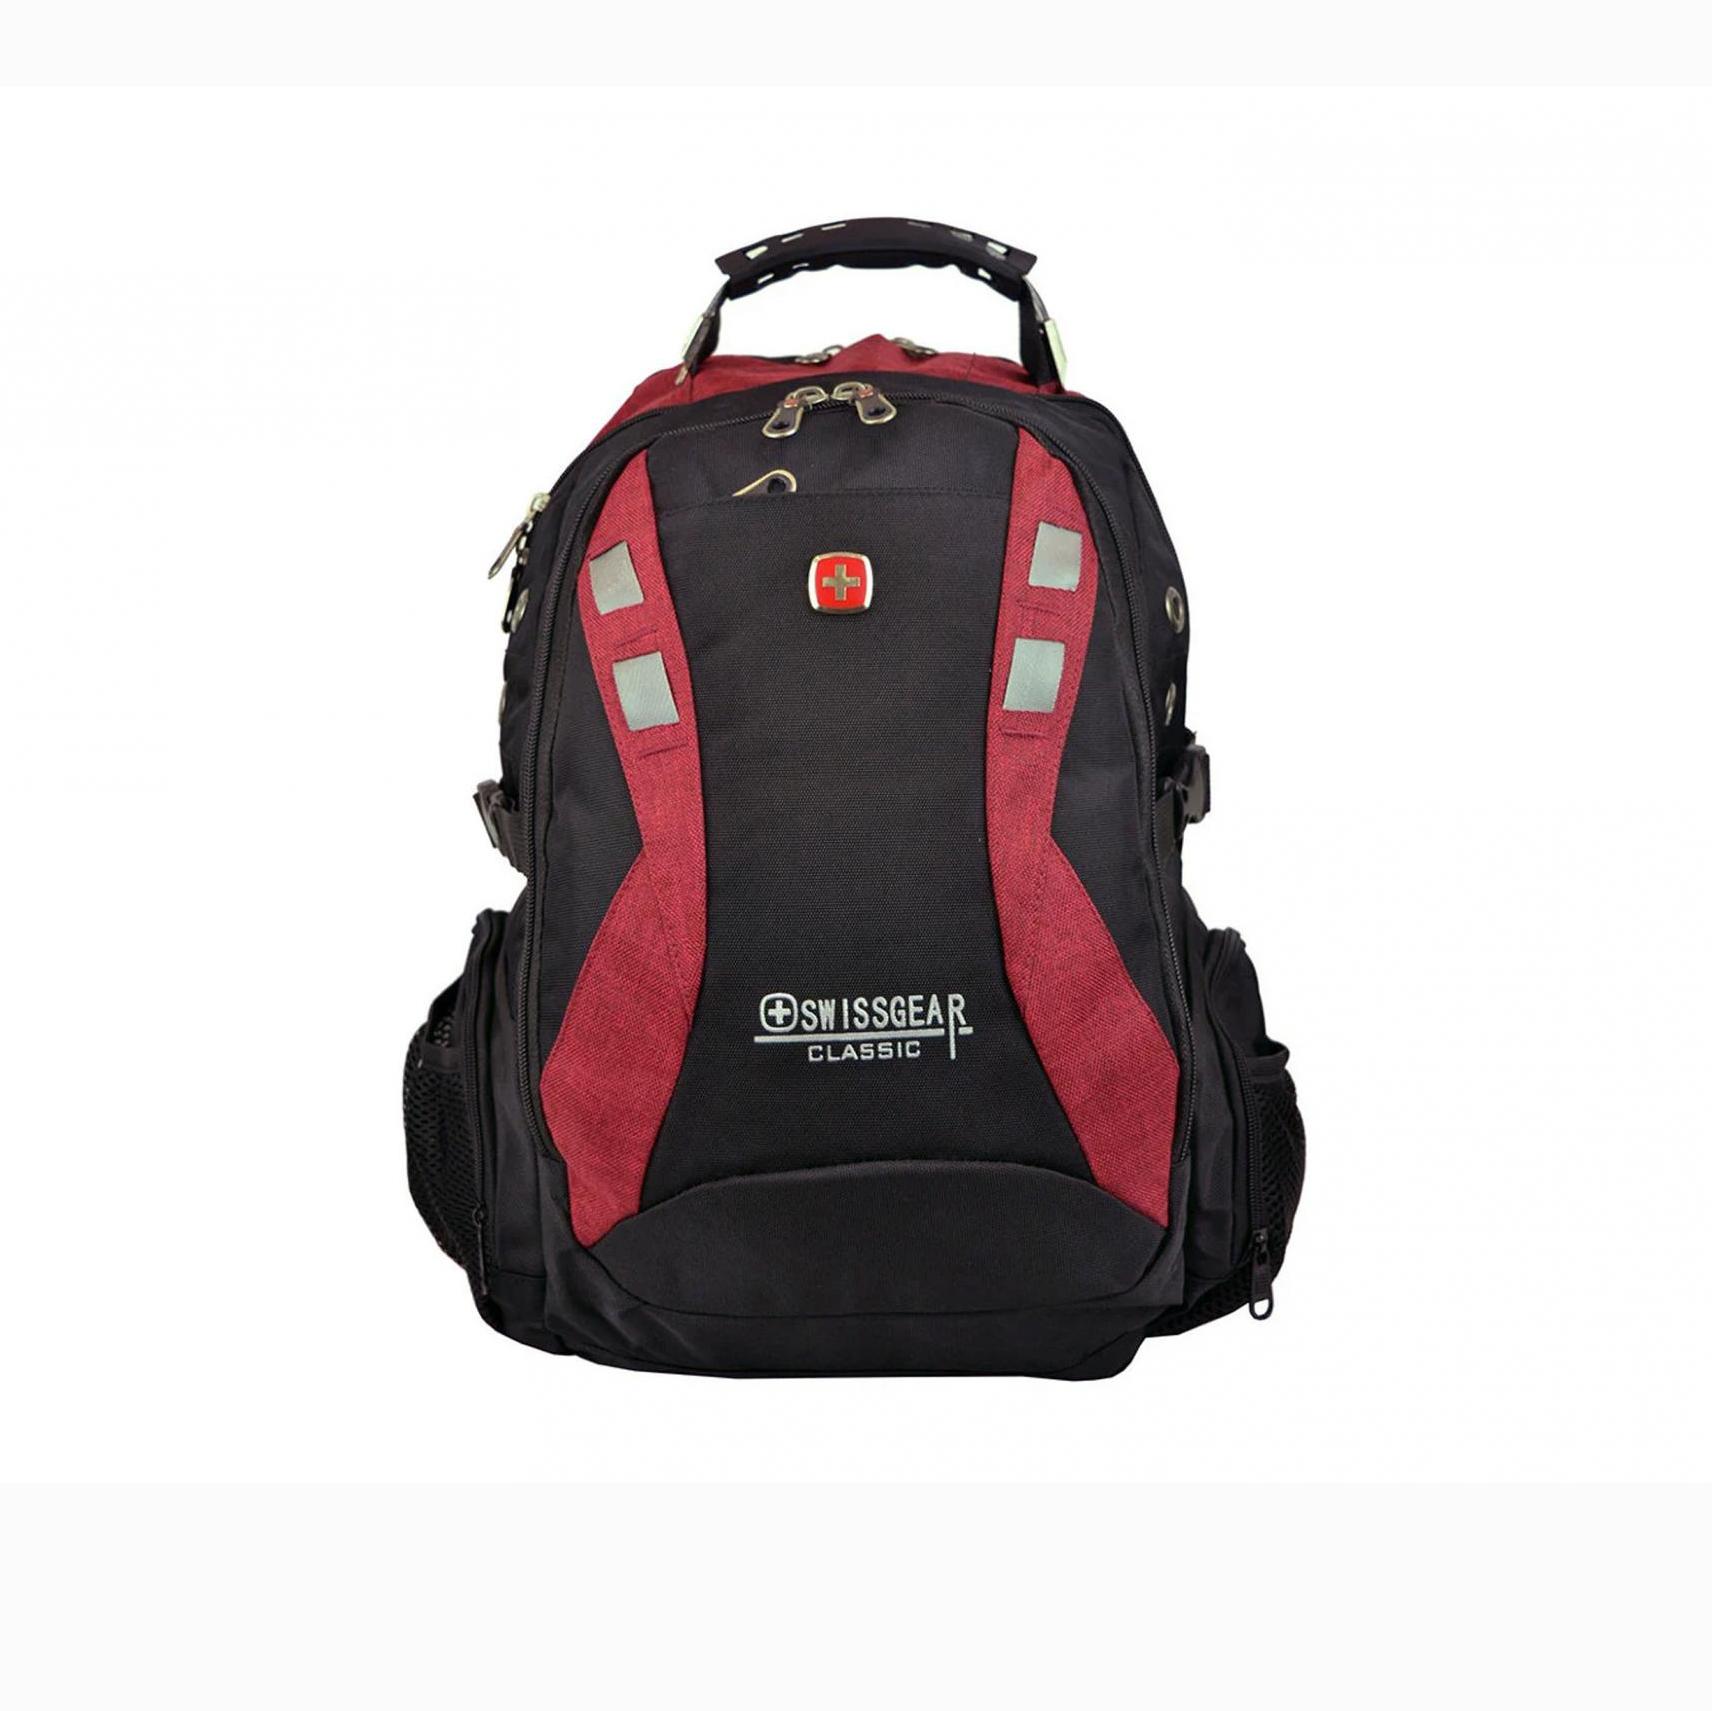 NOTEBOOK BAG SWISSCEAR 9371 BACK COLOR 15.6 صوت+USB ظهر+تطويلة ,Laptop Bag